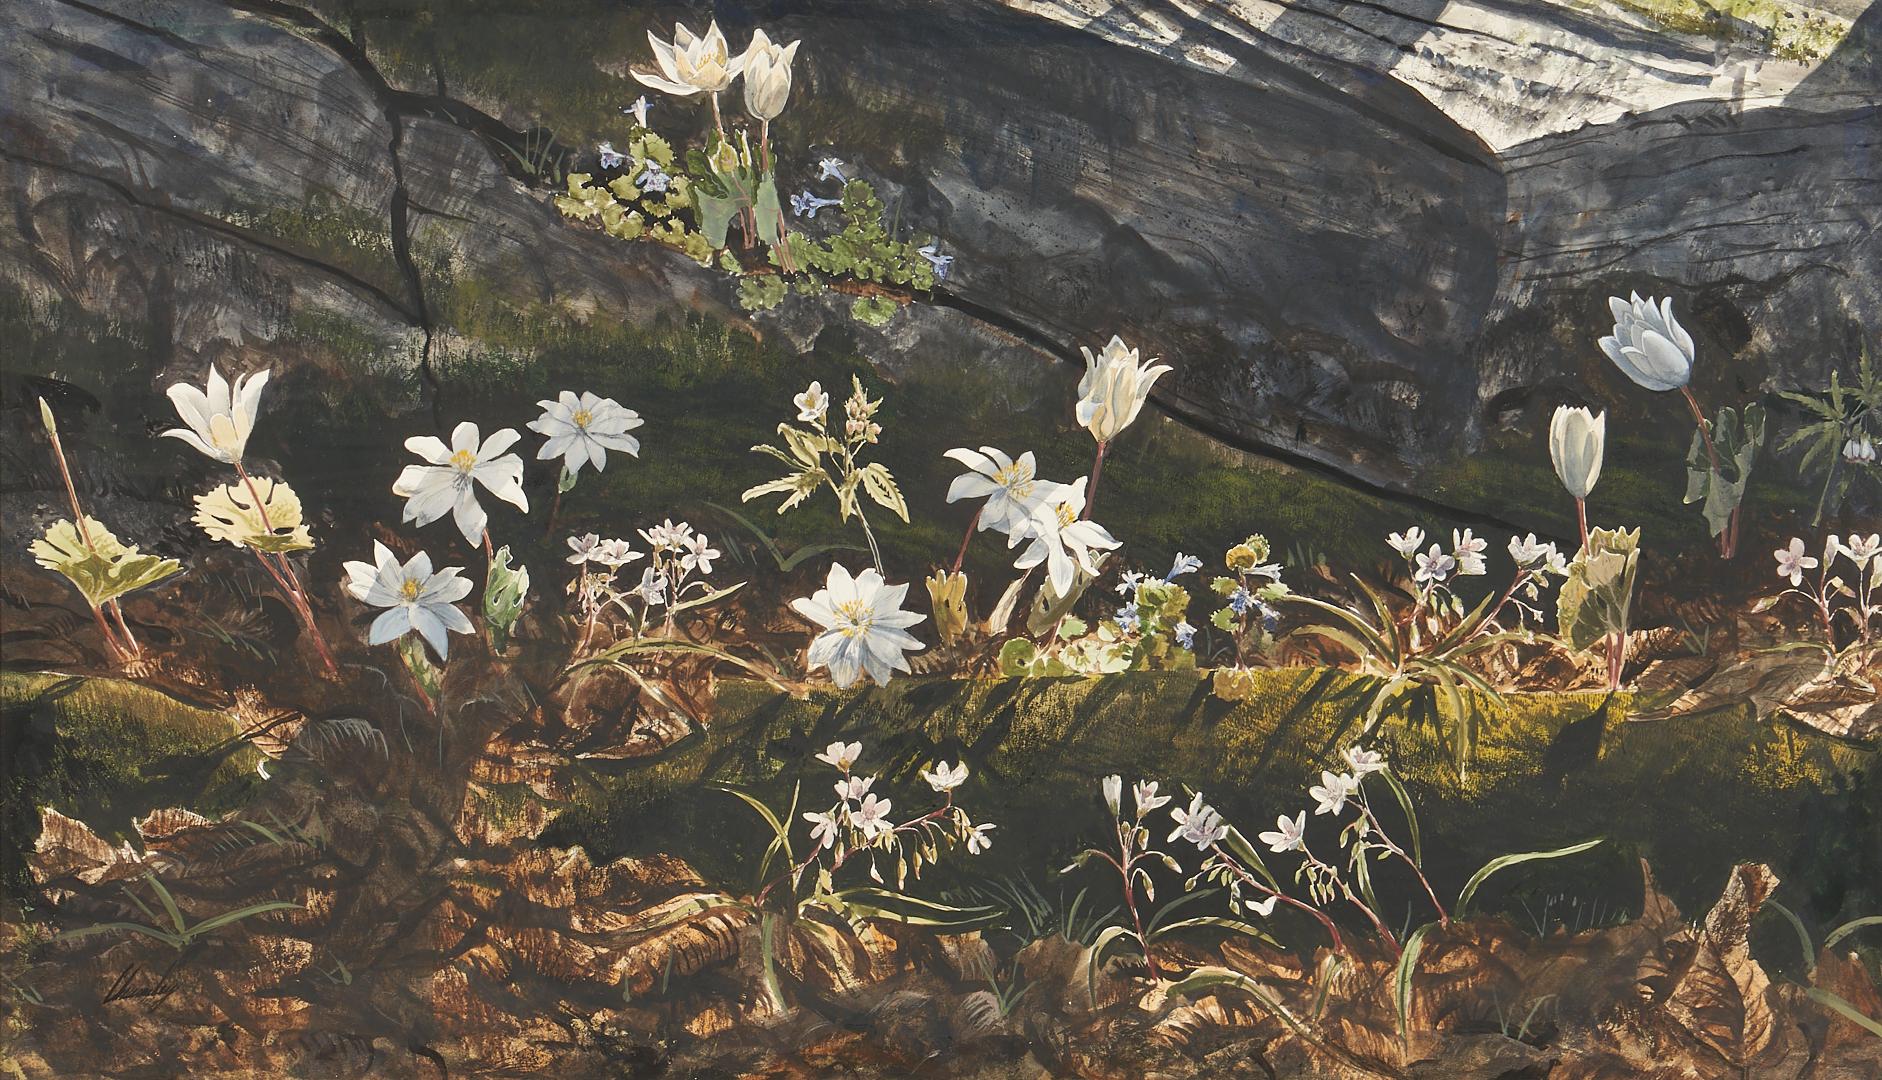 Lot 187: John Chumley Watercolor Woodland Scene, Bloodroot